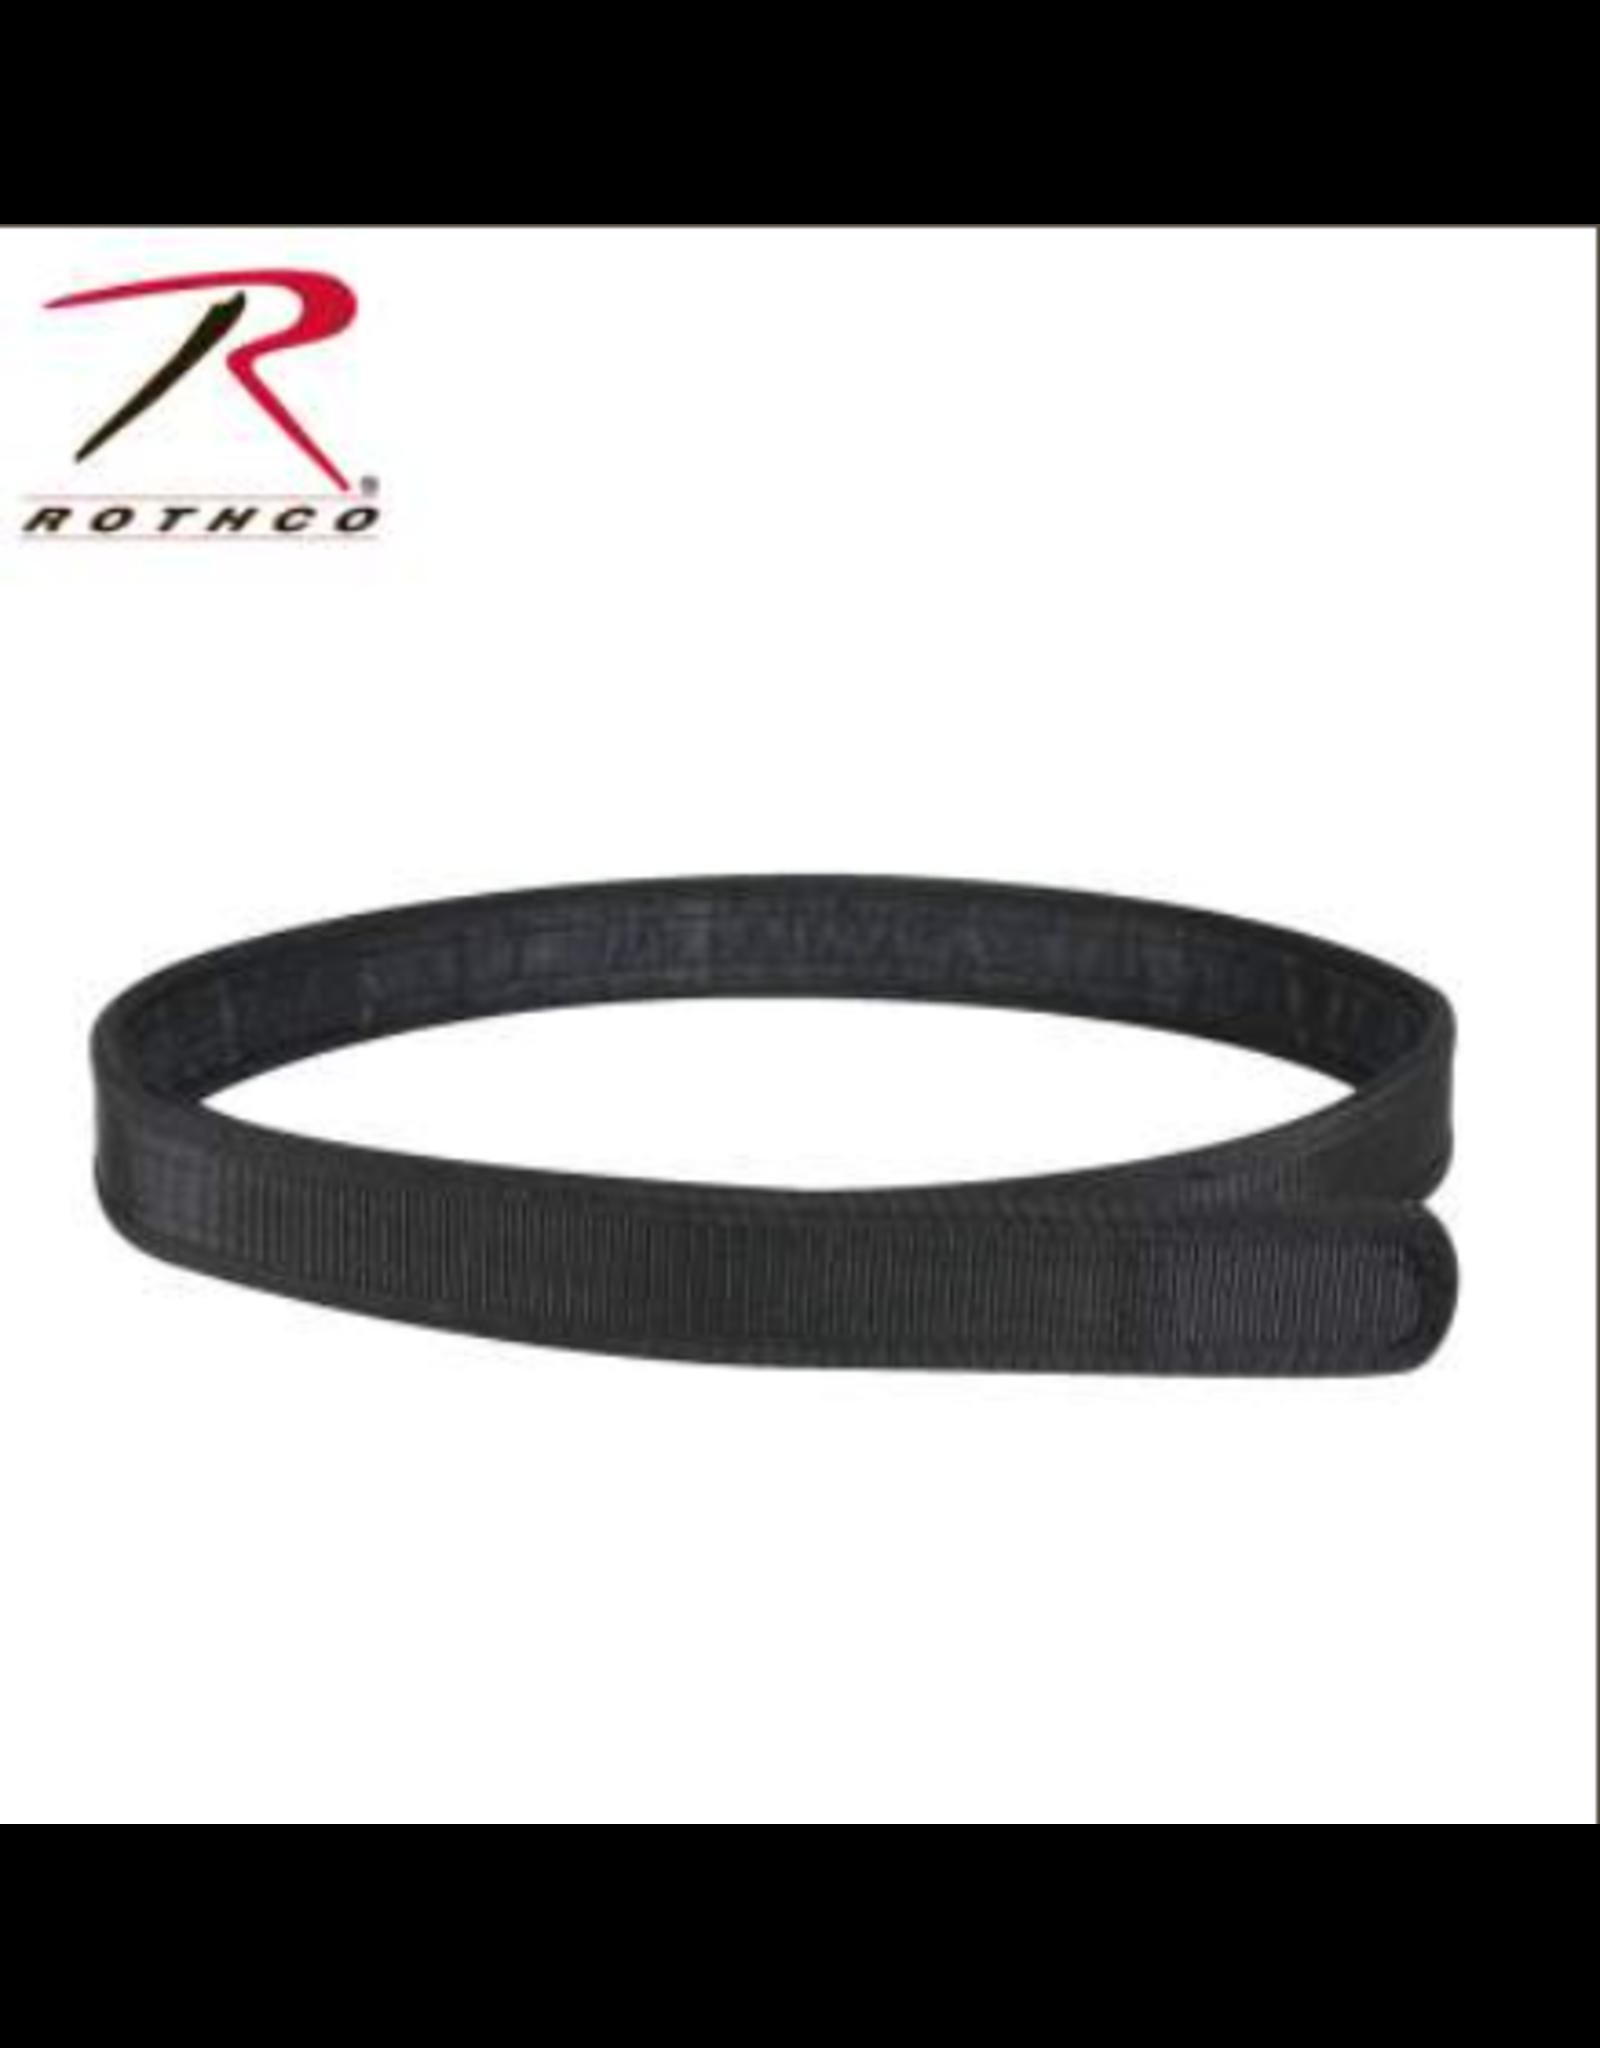 Rothco Rothco Inner Duty Belt w/Hook &loop